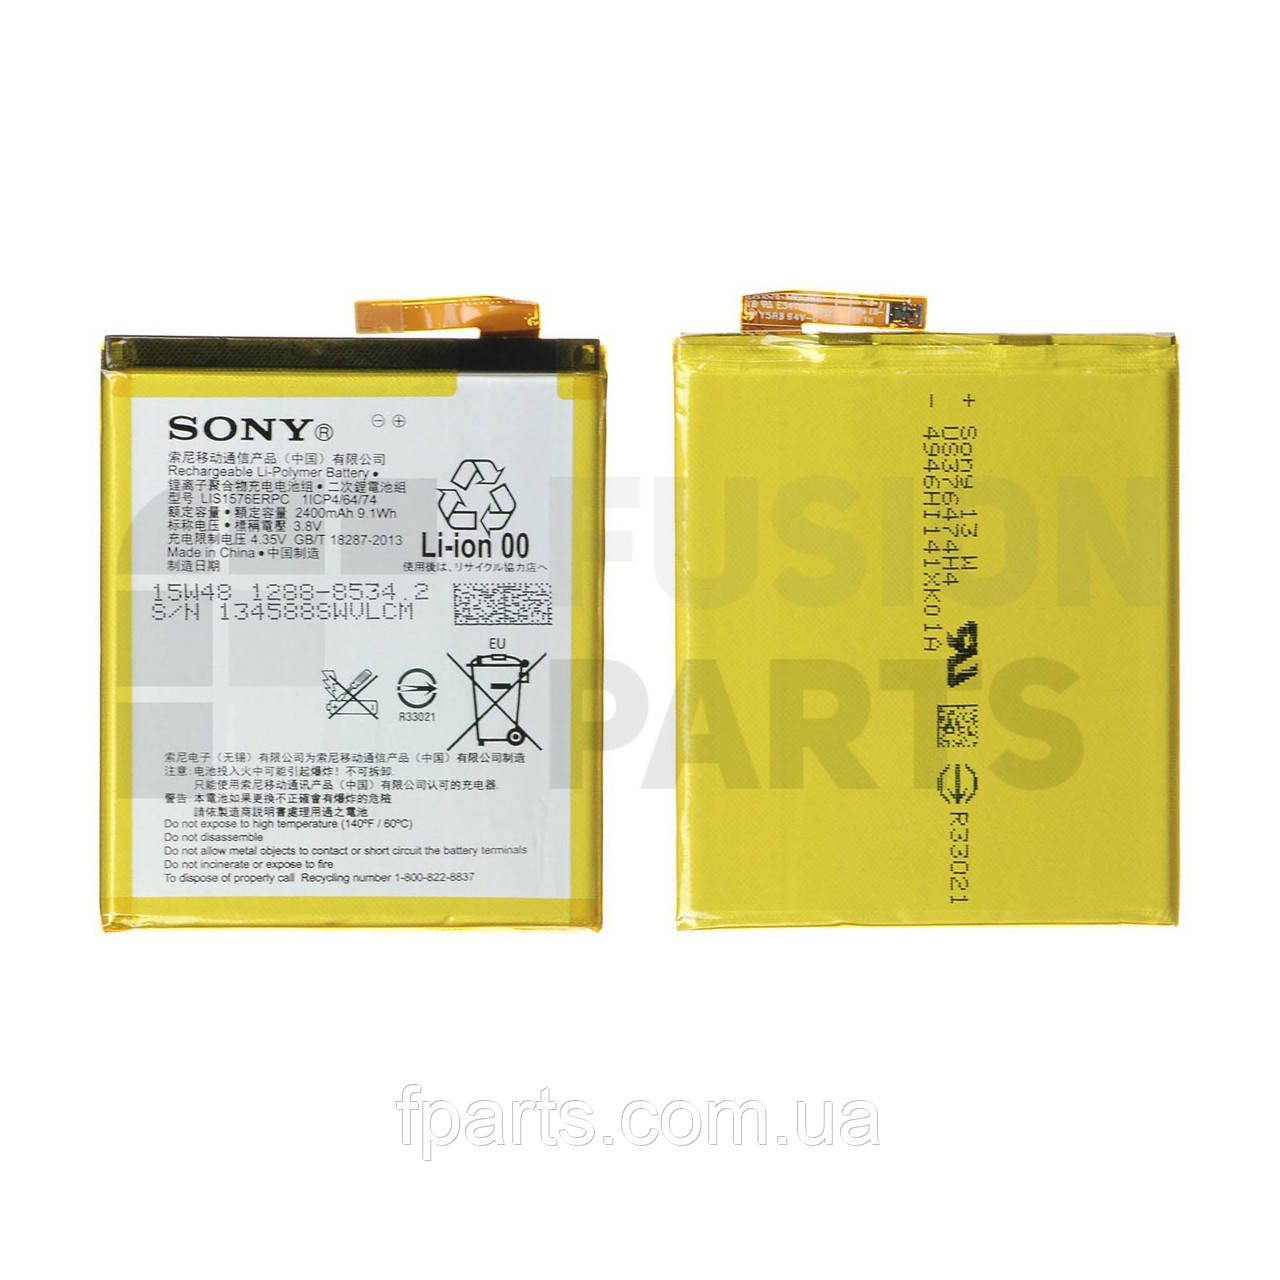 АКБ Sony E2303, E2306, E2312, E2333, E2353, E2363 Xperia M4 Aqua / LIS1576ERPC 2400 mAh Original